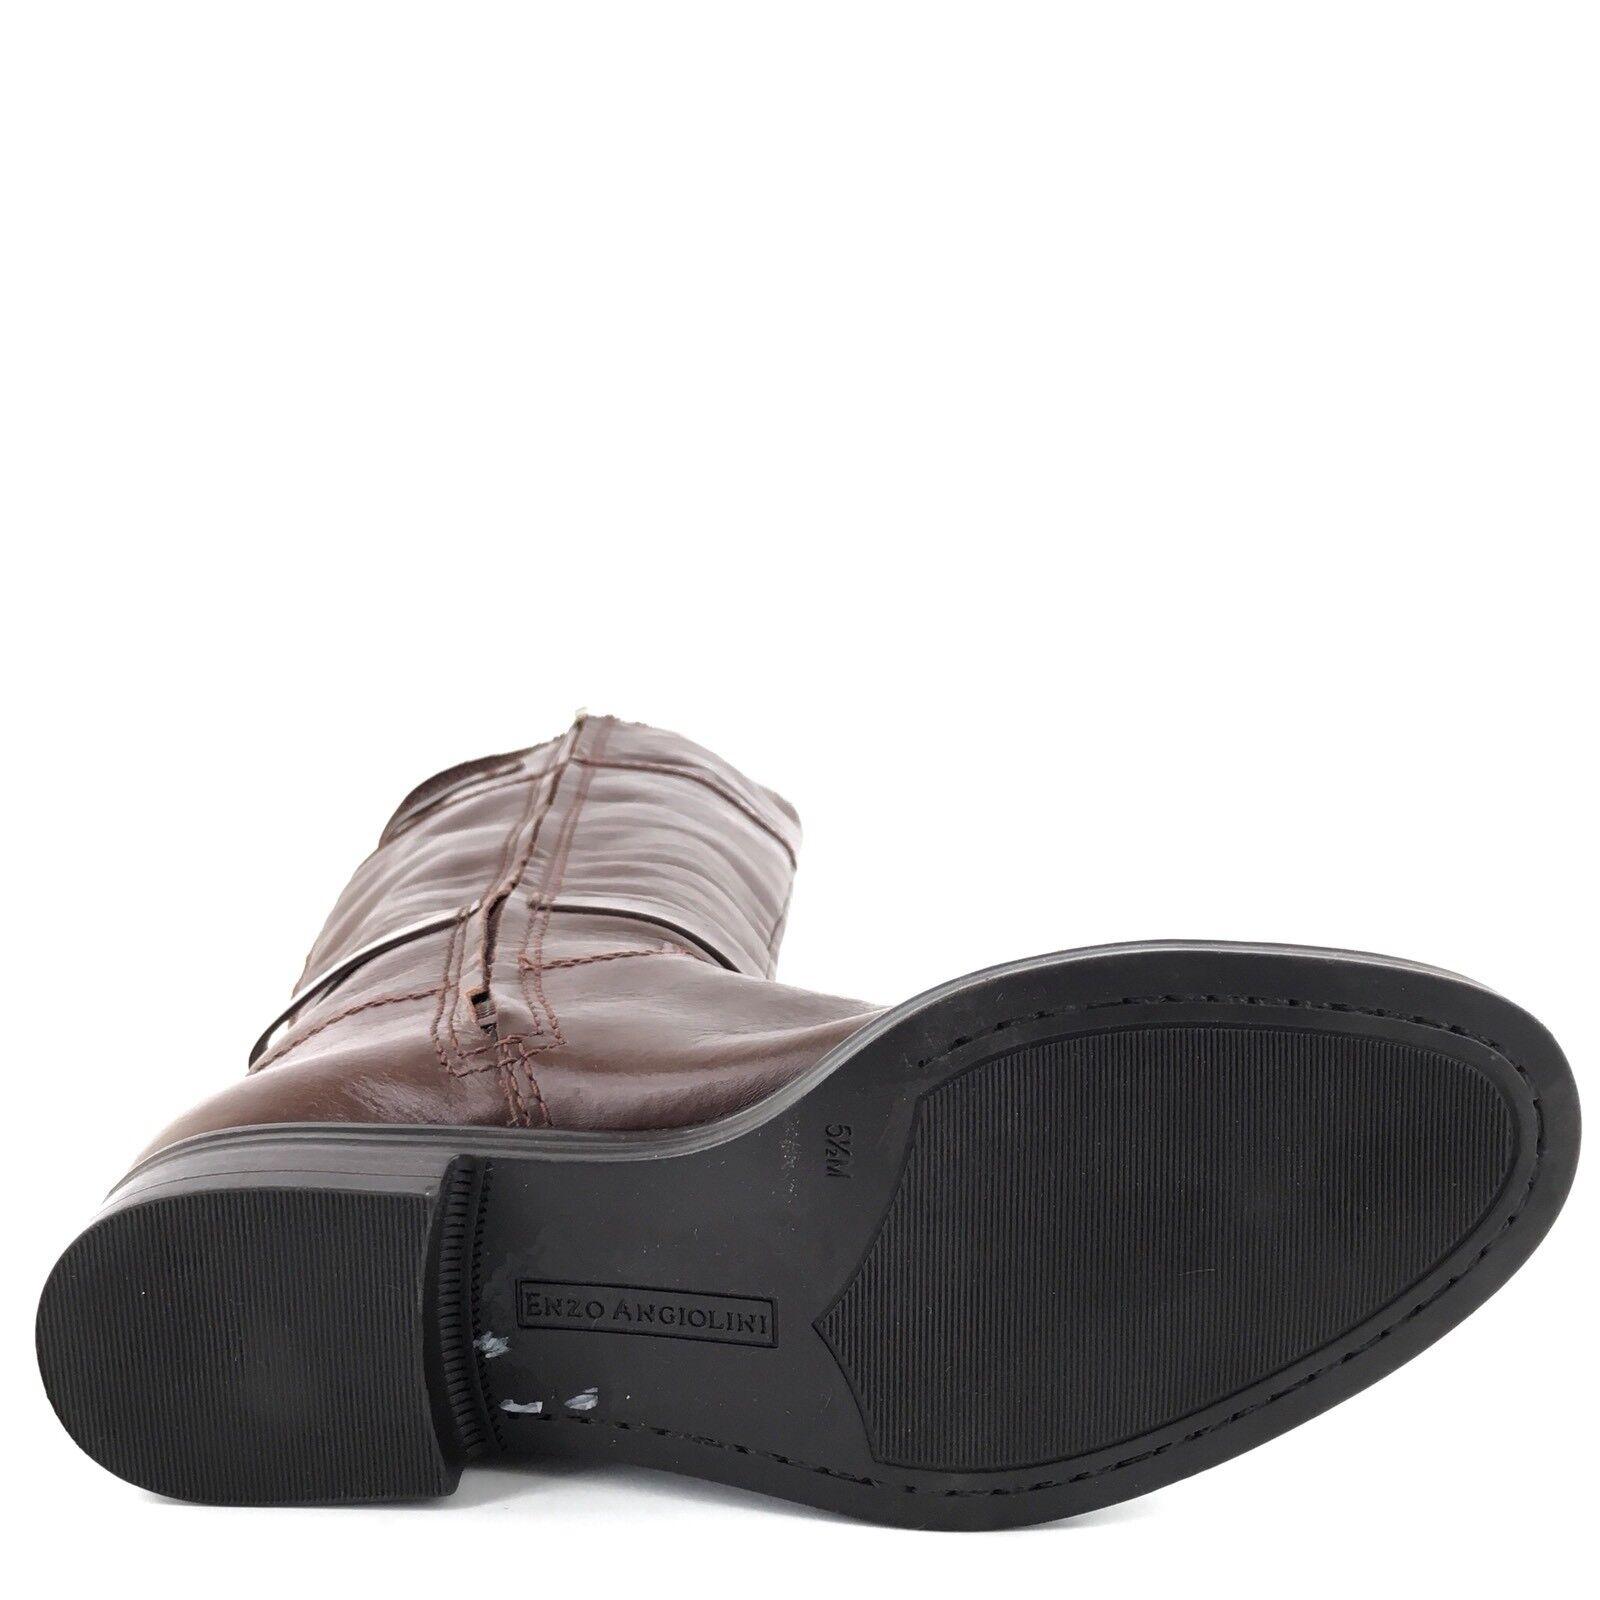 New Enzo Angiolini Eero Braun Leder Knee High Stiefel Damens's M Größe 5.5 M Damens's ^ 2d6b65